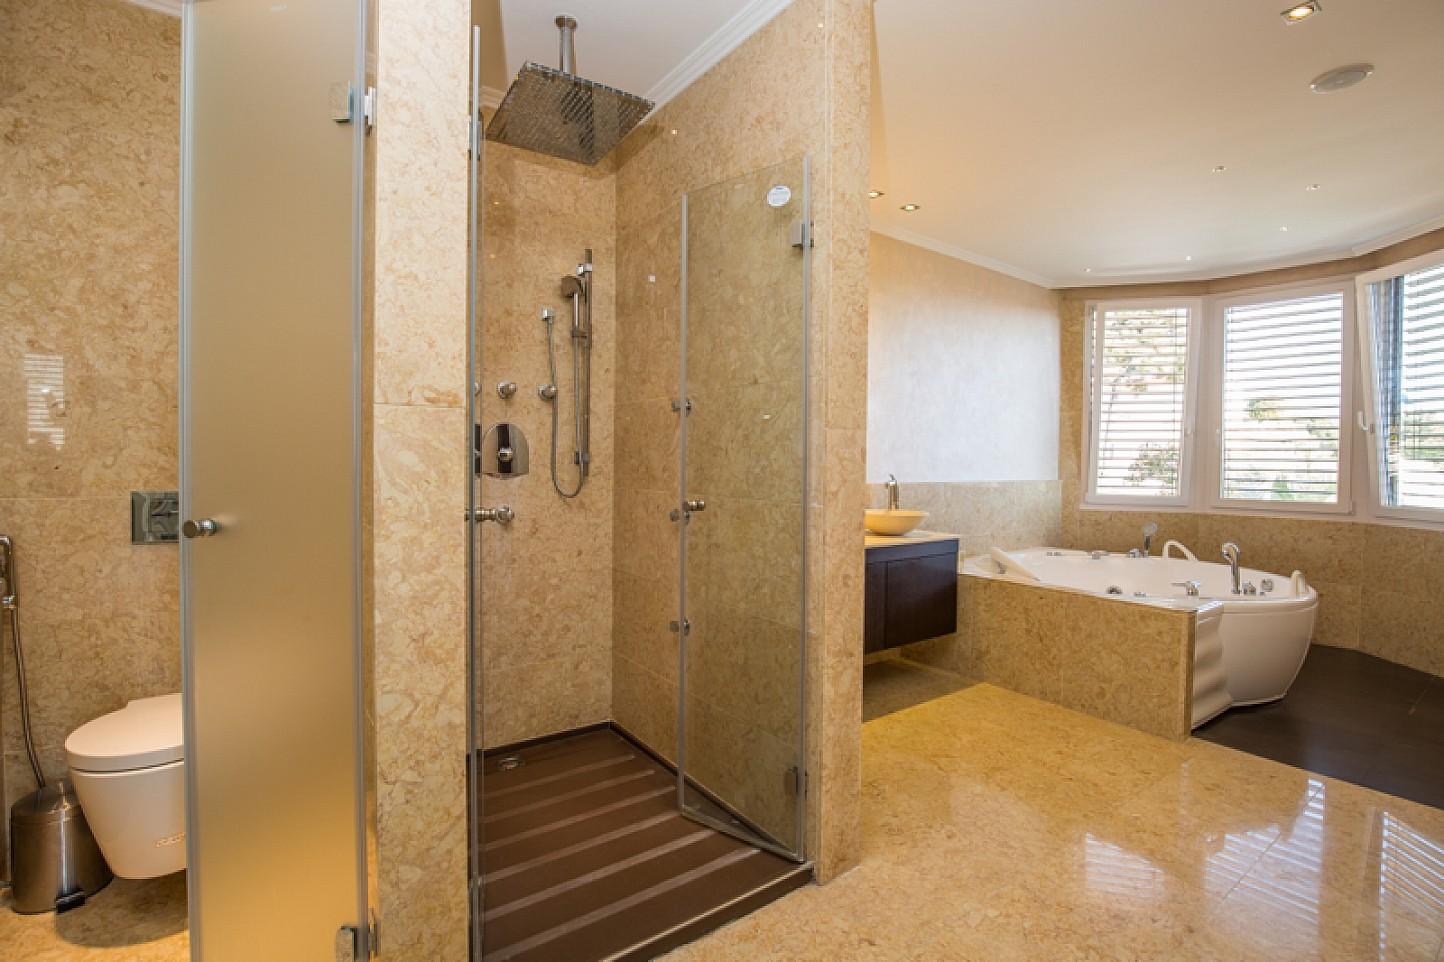 Bany amb dutxa i banyera